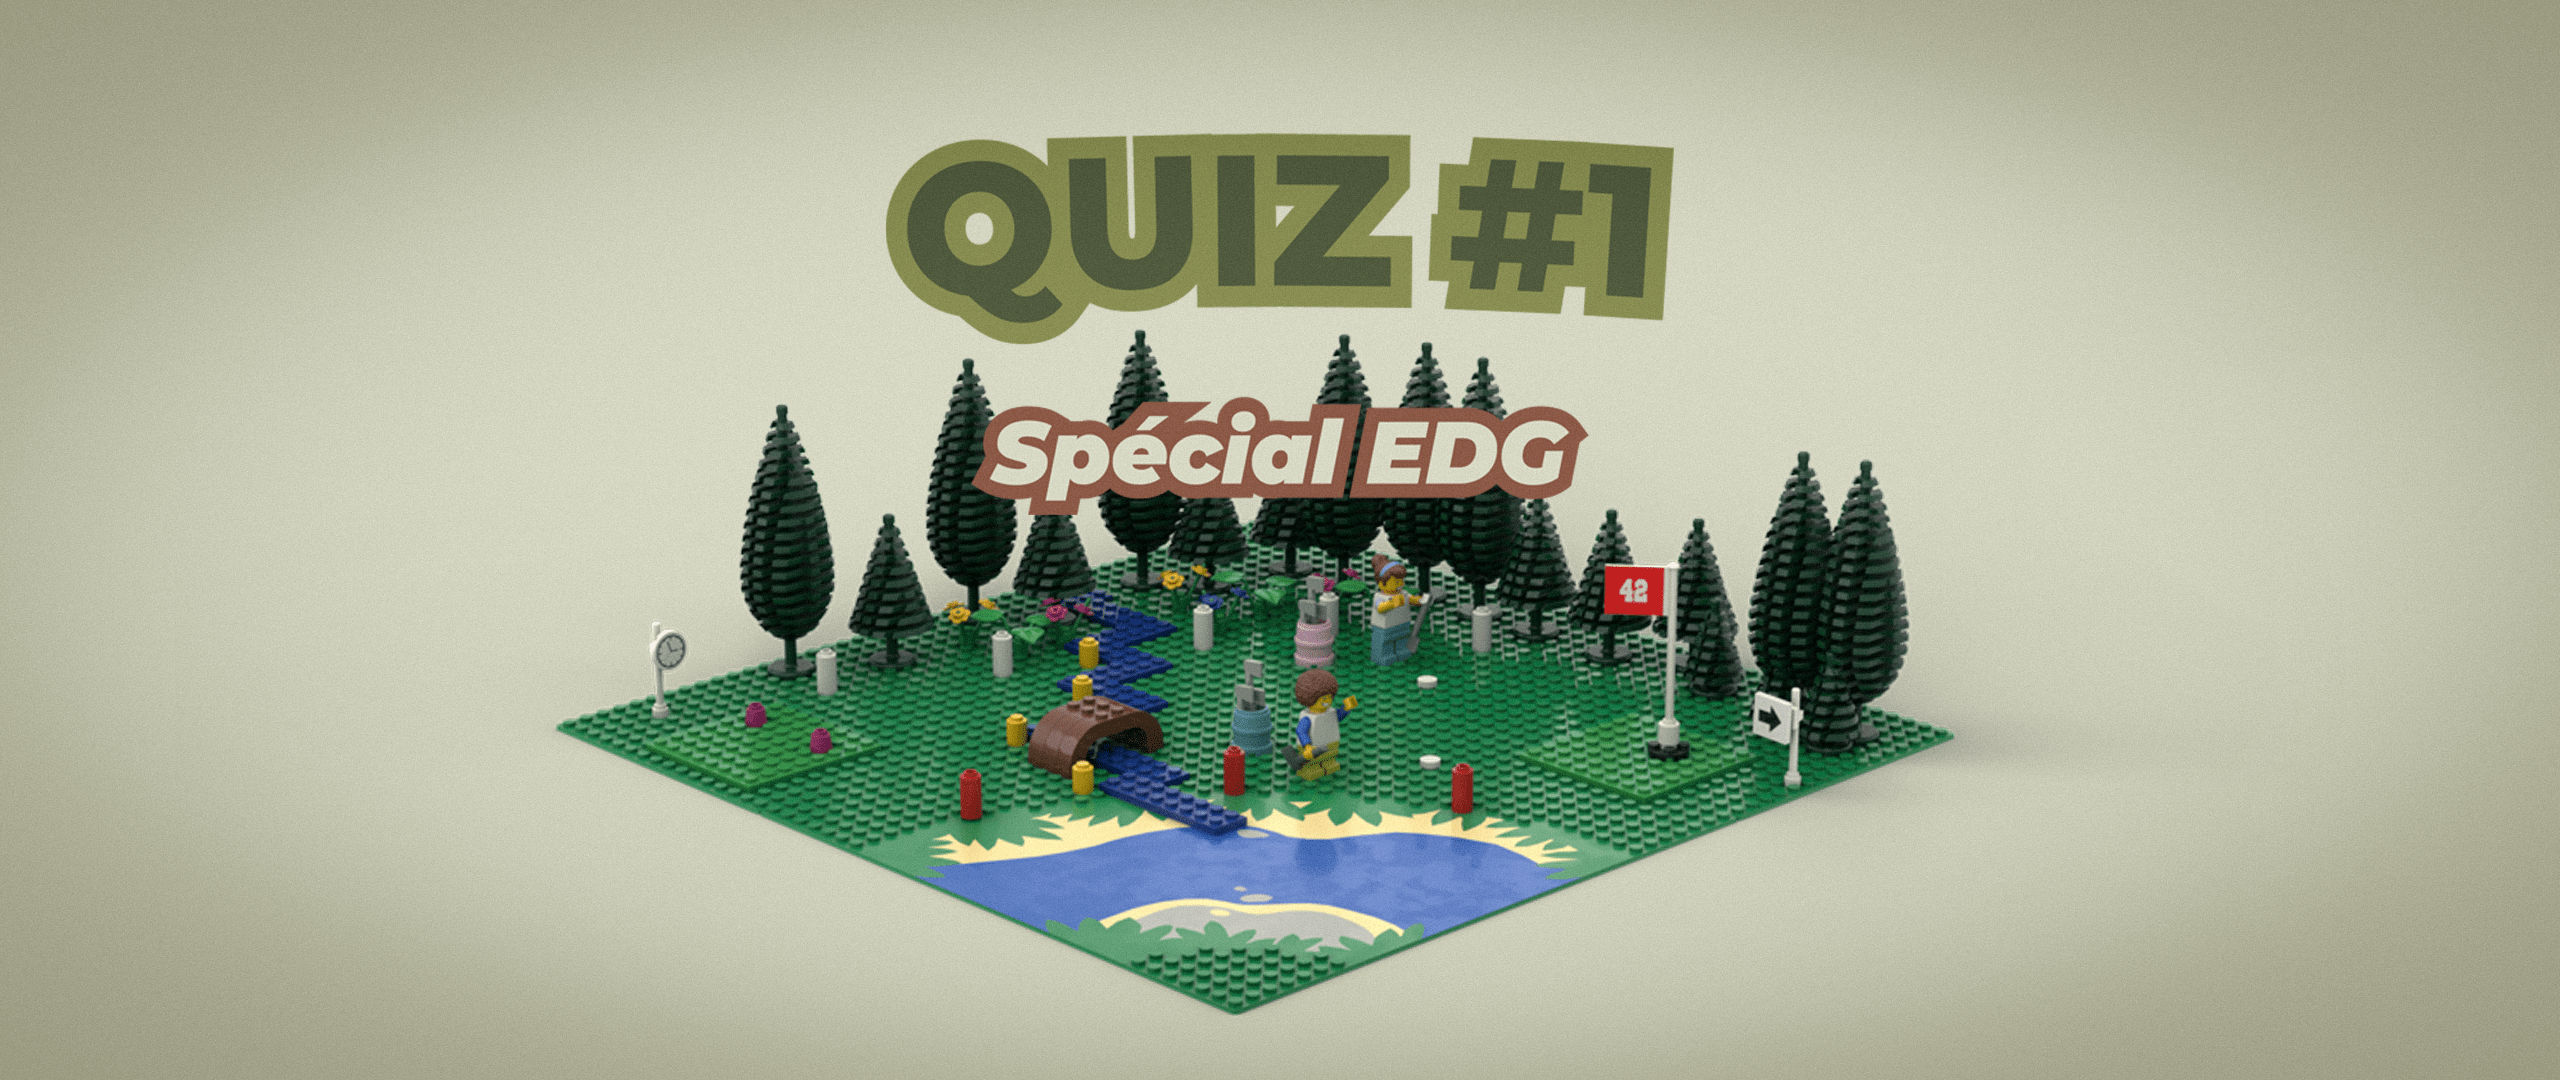 Golf O Quizz Edg 2021 Quiz 1 Header